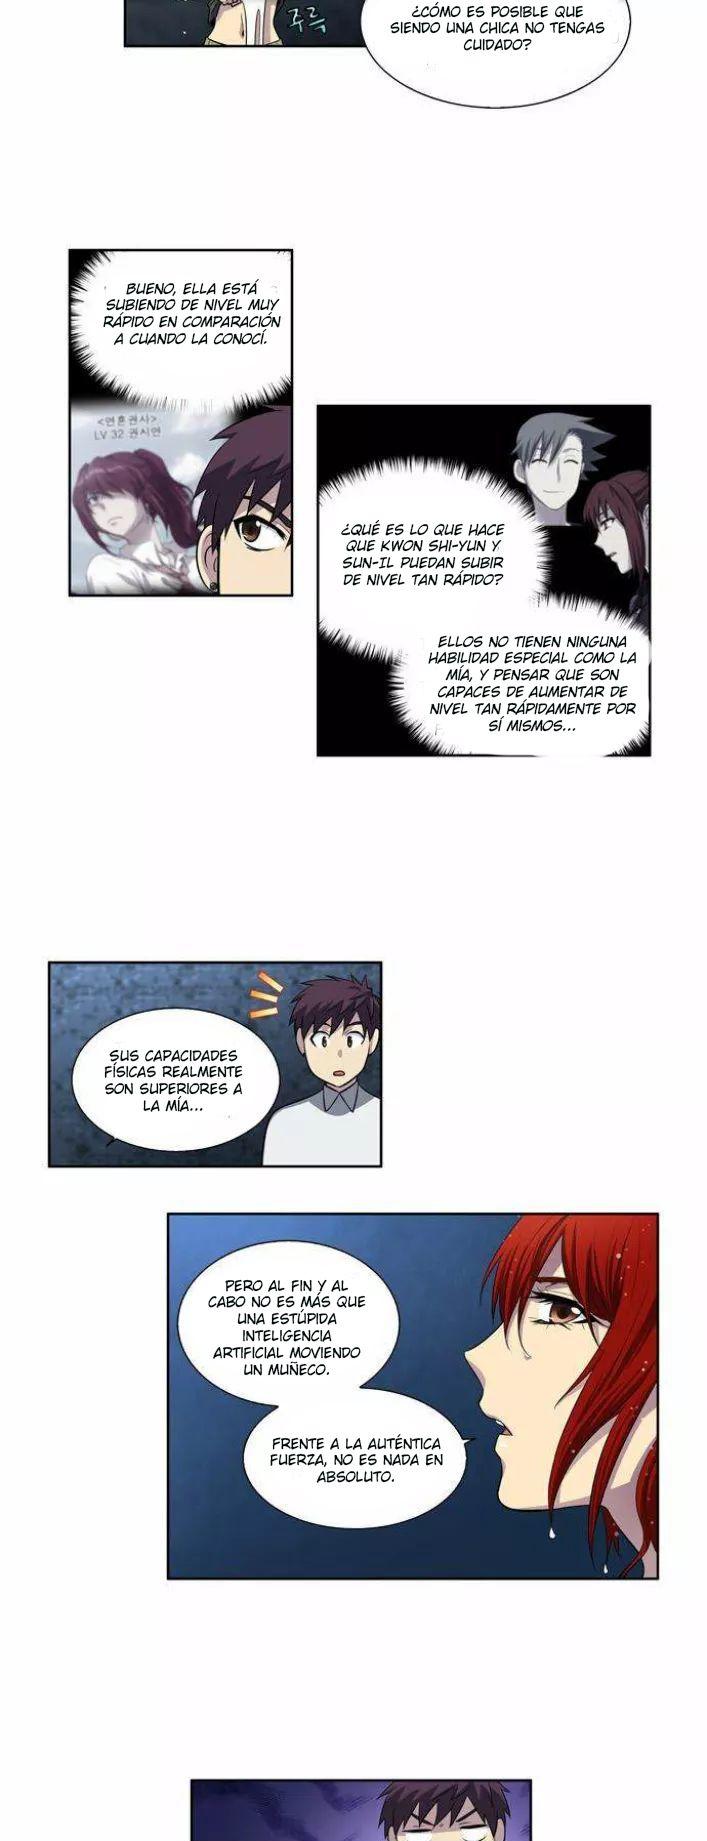 https://c5.ninemanga.com/es_manga/61/1725/485892/74e48c1a38cb4022d50c45dbd3be1f9a.jpg Page 18